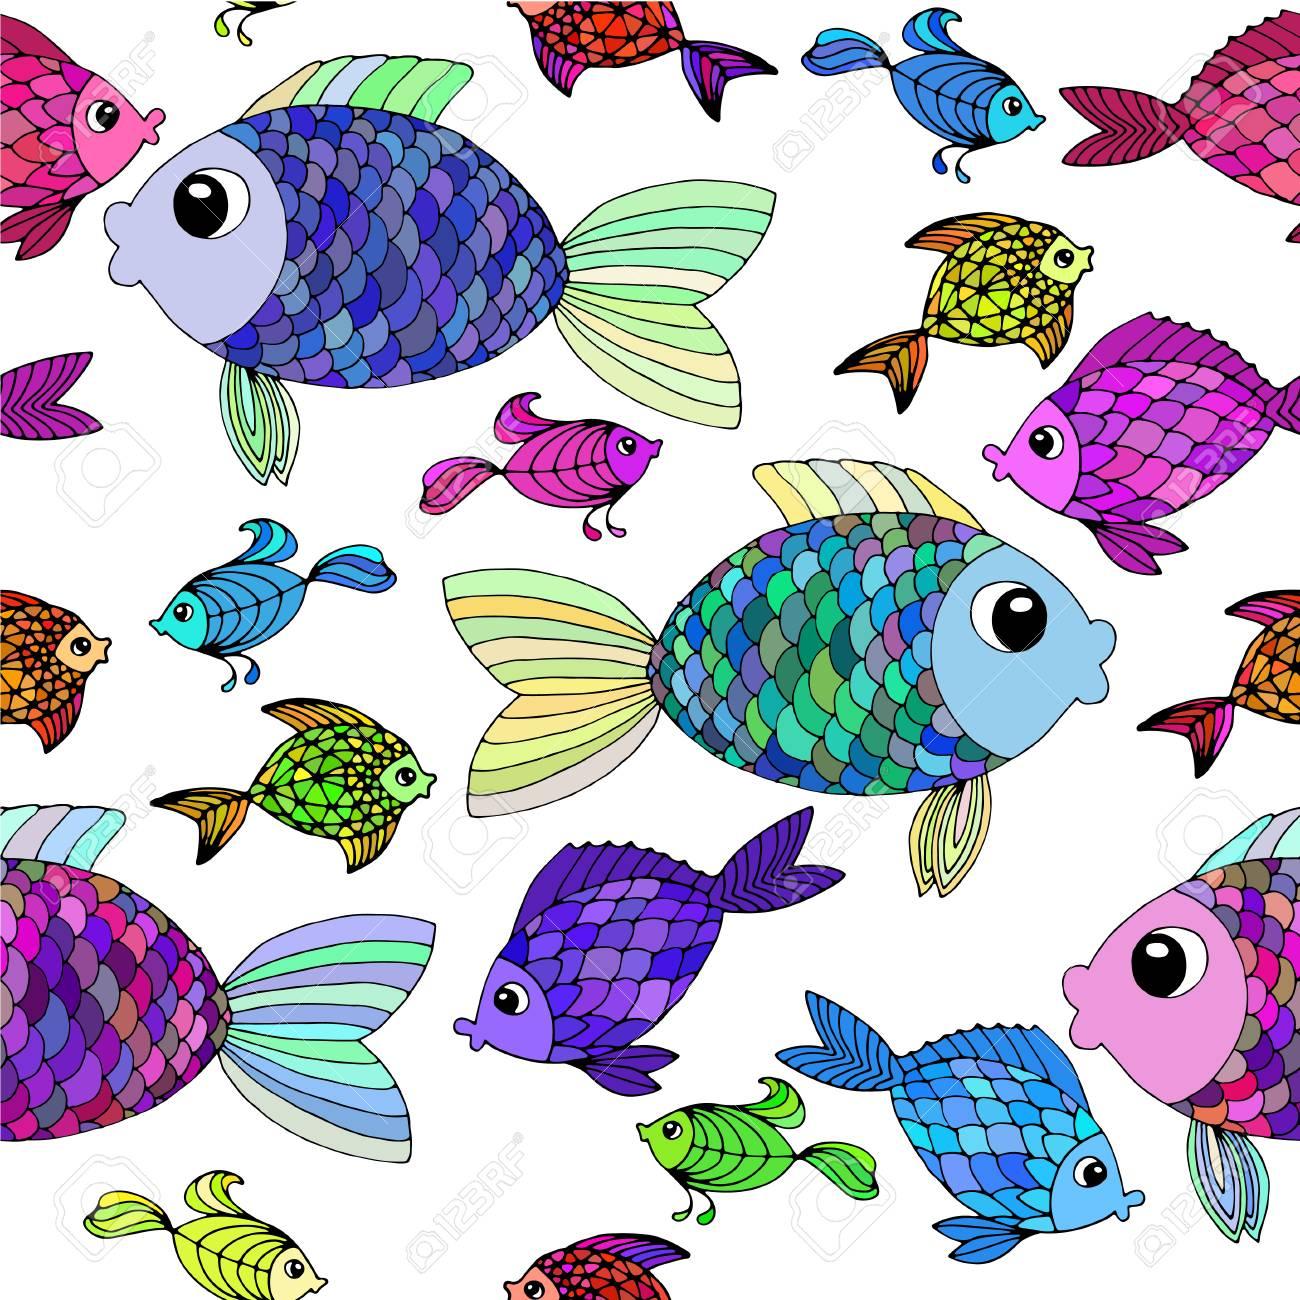 Cartoon Fish Background Stylized Hand Drawn Fish Wallpaper